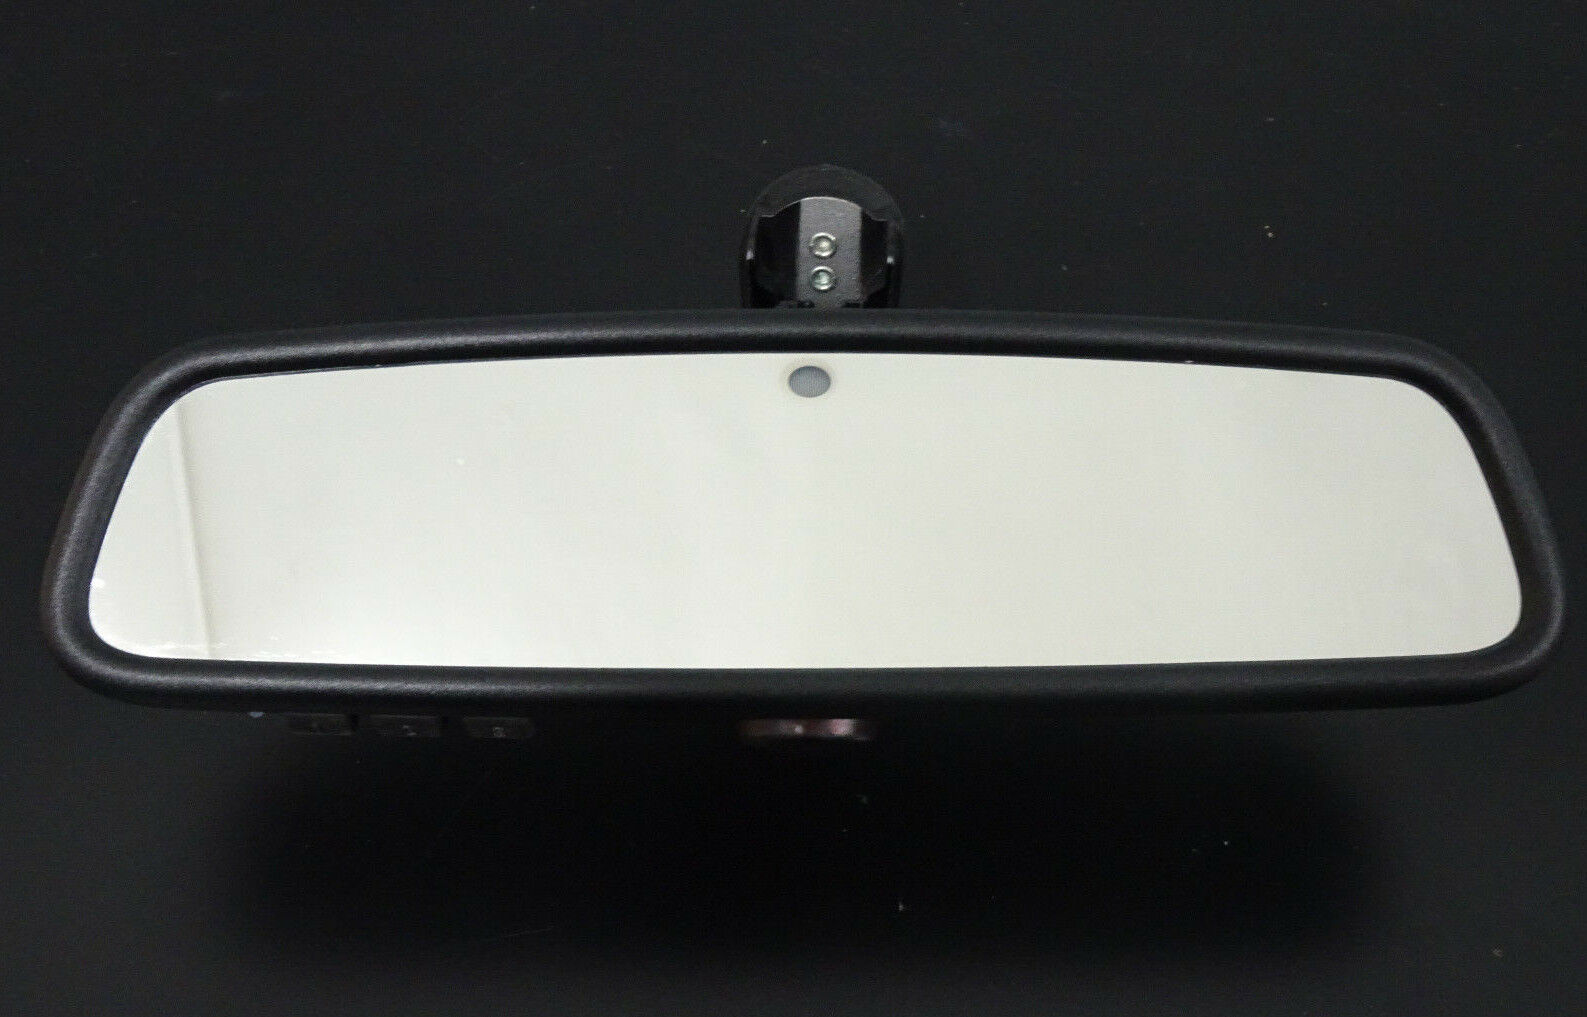 SODIAL Espejo Retrovisor De Fibra De Carbono Pegatina Antirrayas para BMW E90 E60 E34 E46 E39 F30 F10 F20 X1 X3 X5 X6 Car Styling A Negro